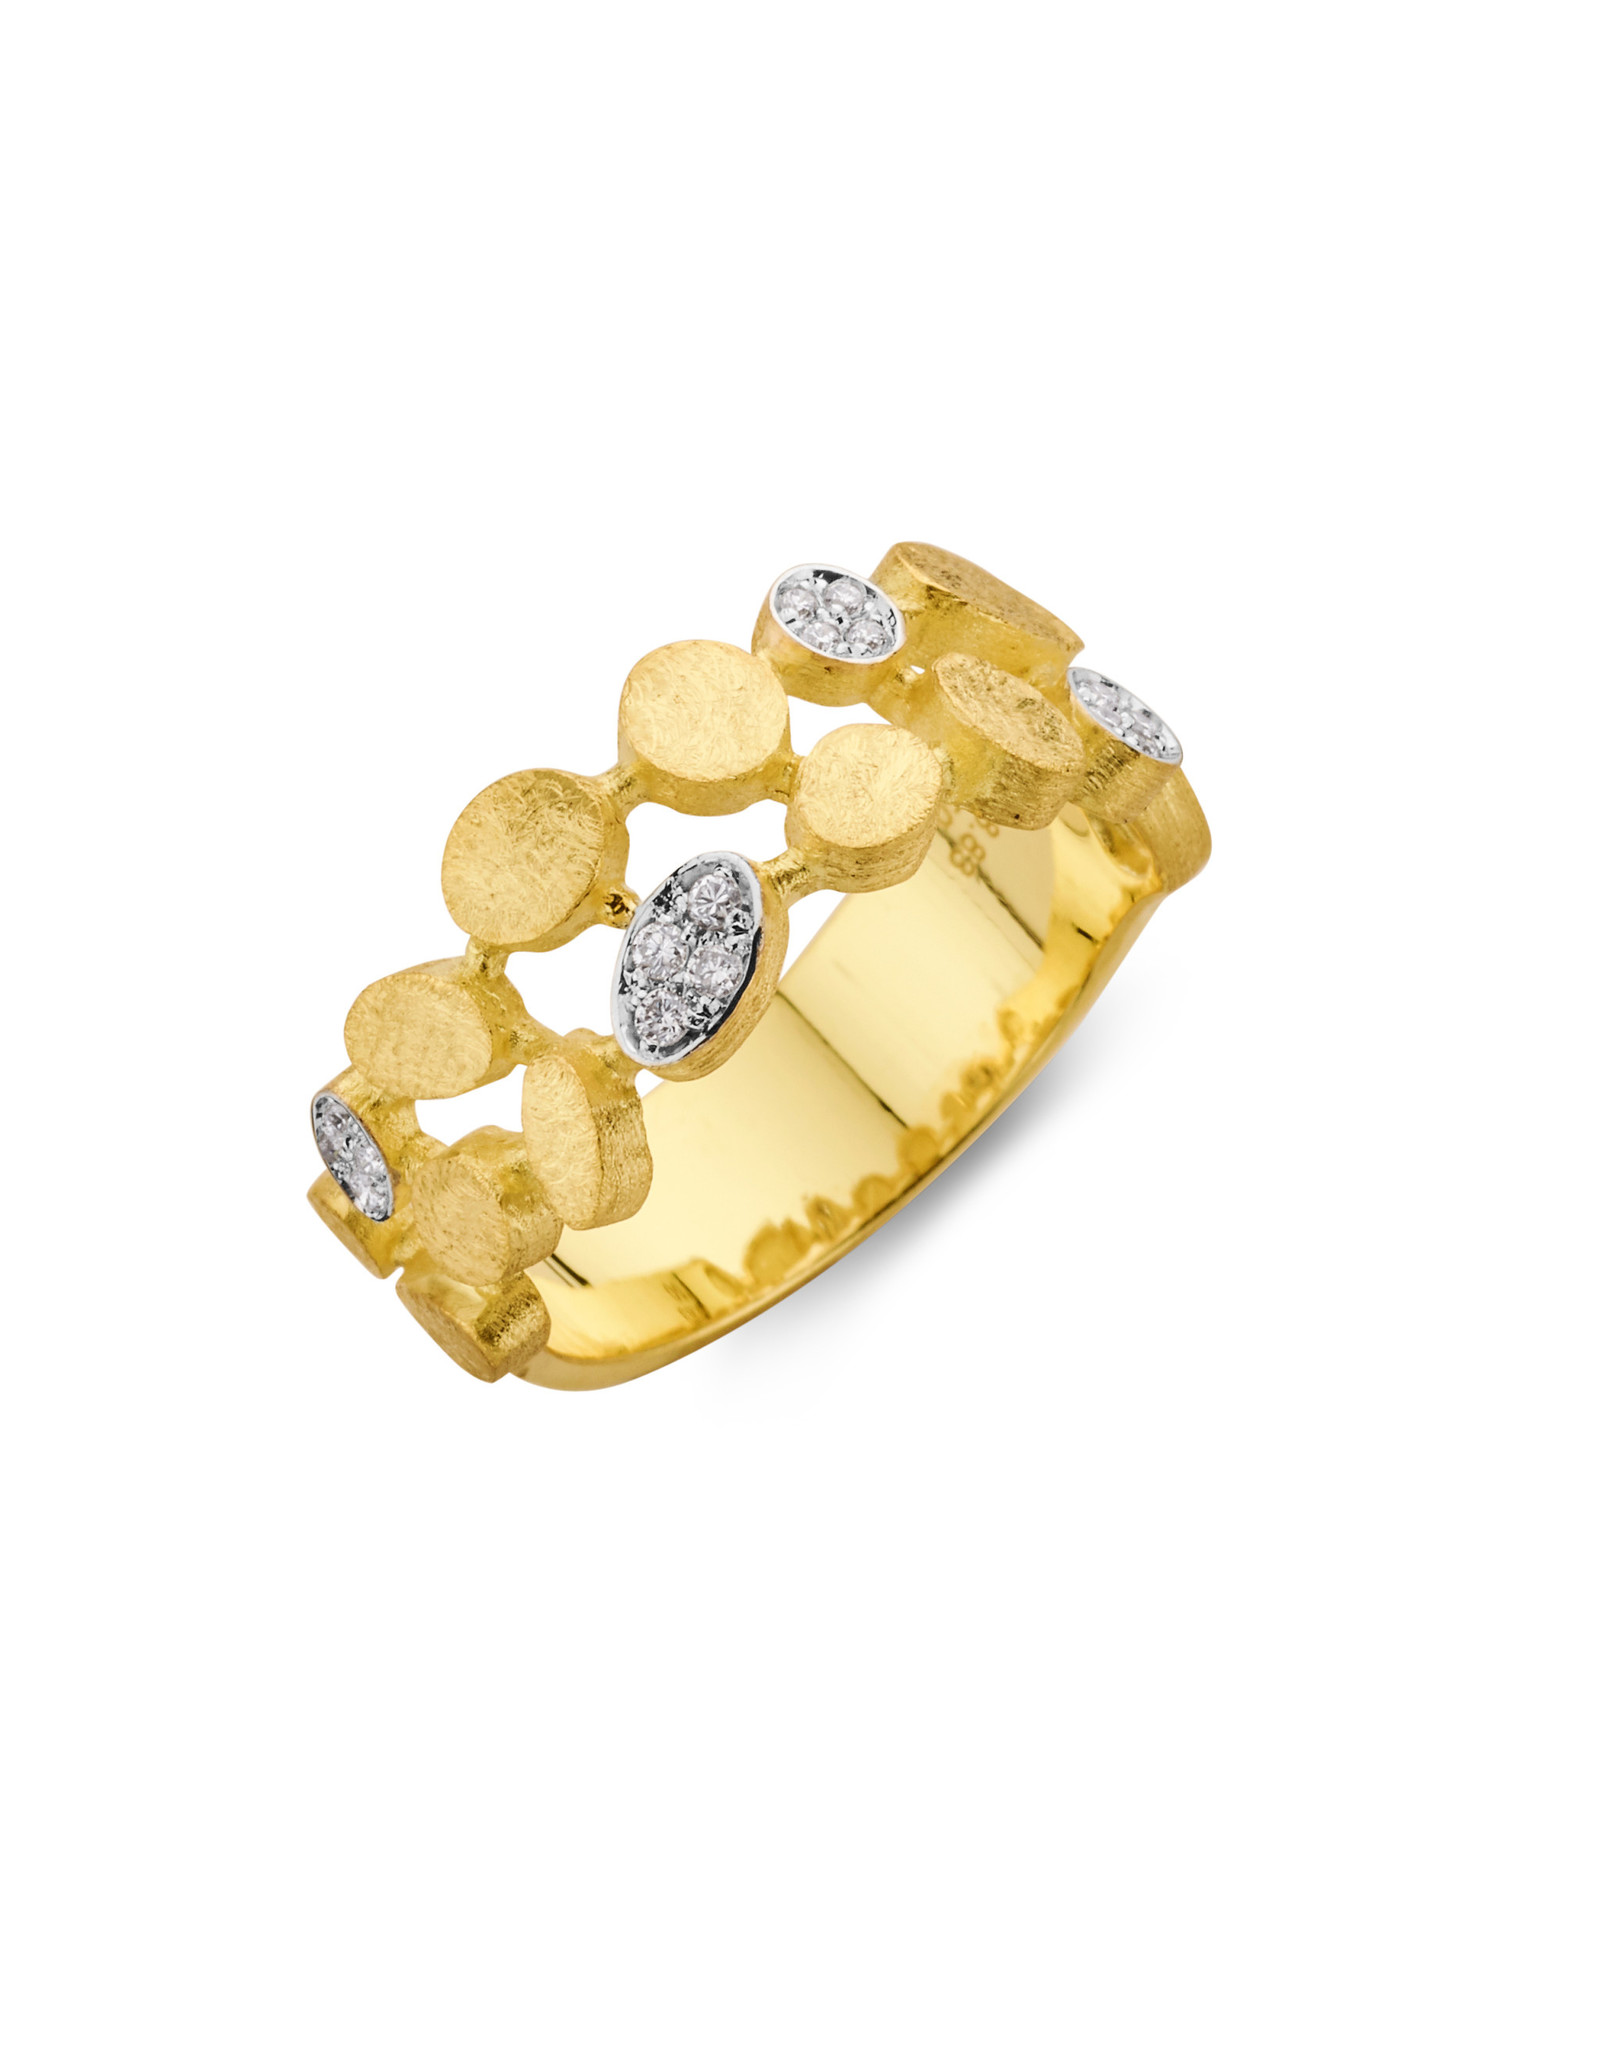 Femme adoree Ring geel goud 18kt 0.11ct 03R0312